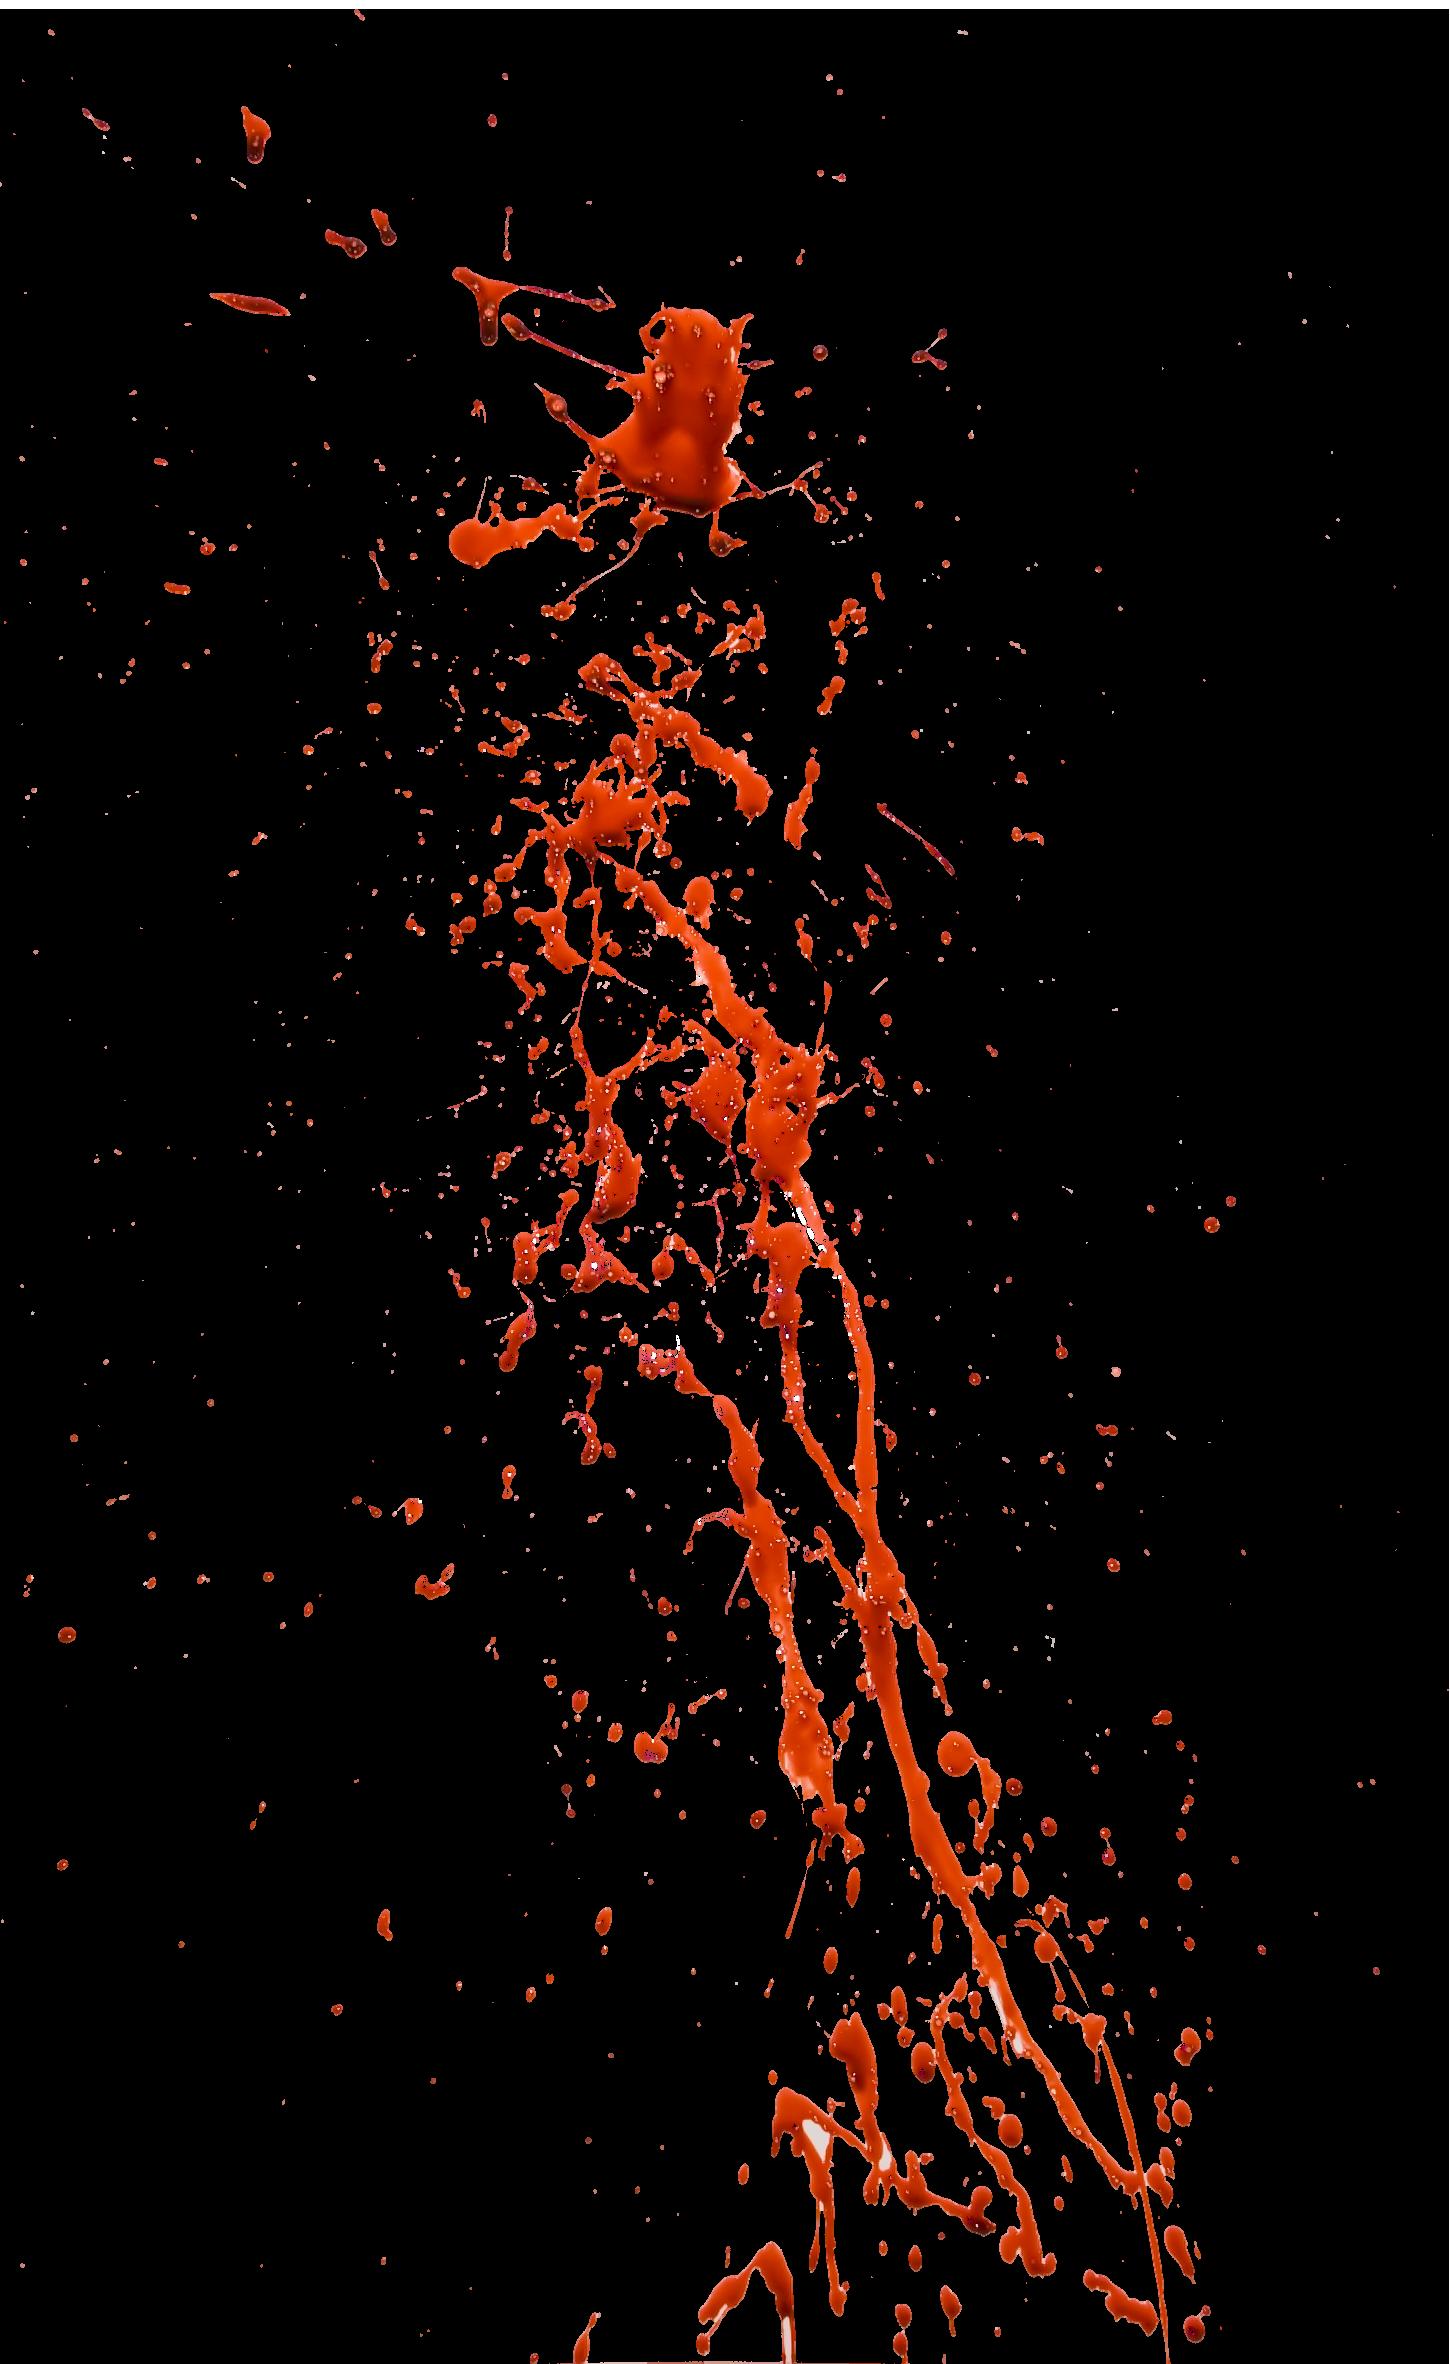 Blood PNG Images Transparent Free Download   PNGMart.com